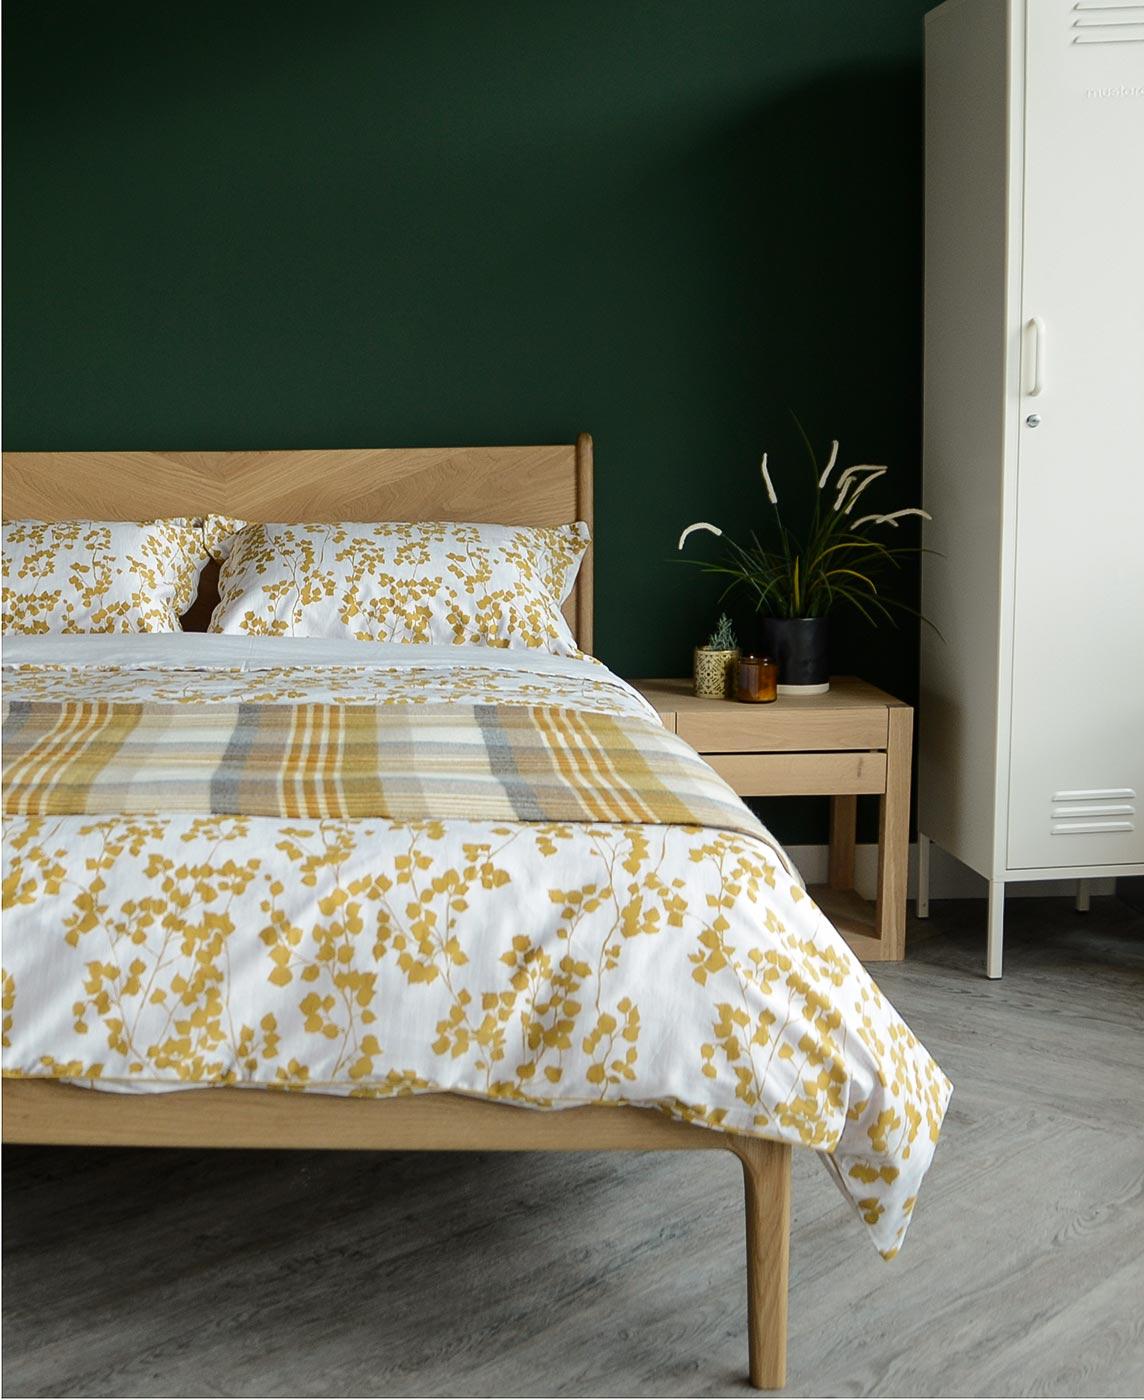 spring summer bedding, mustard yellow leaf print on white